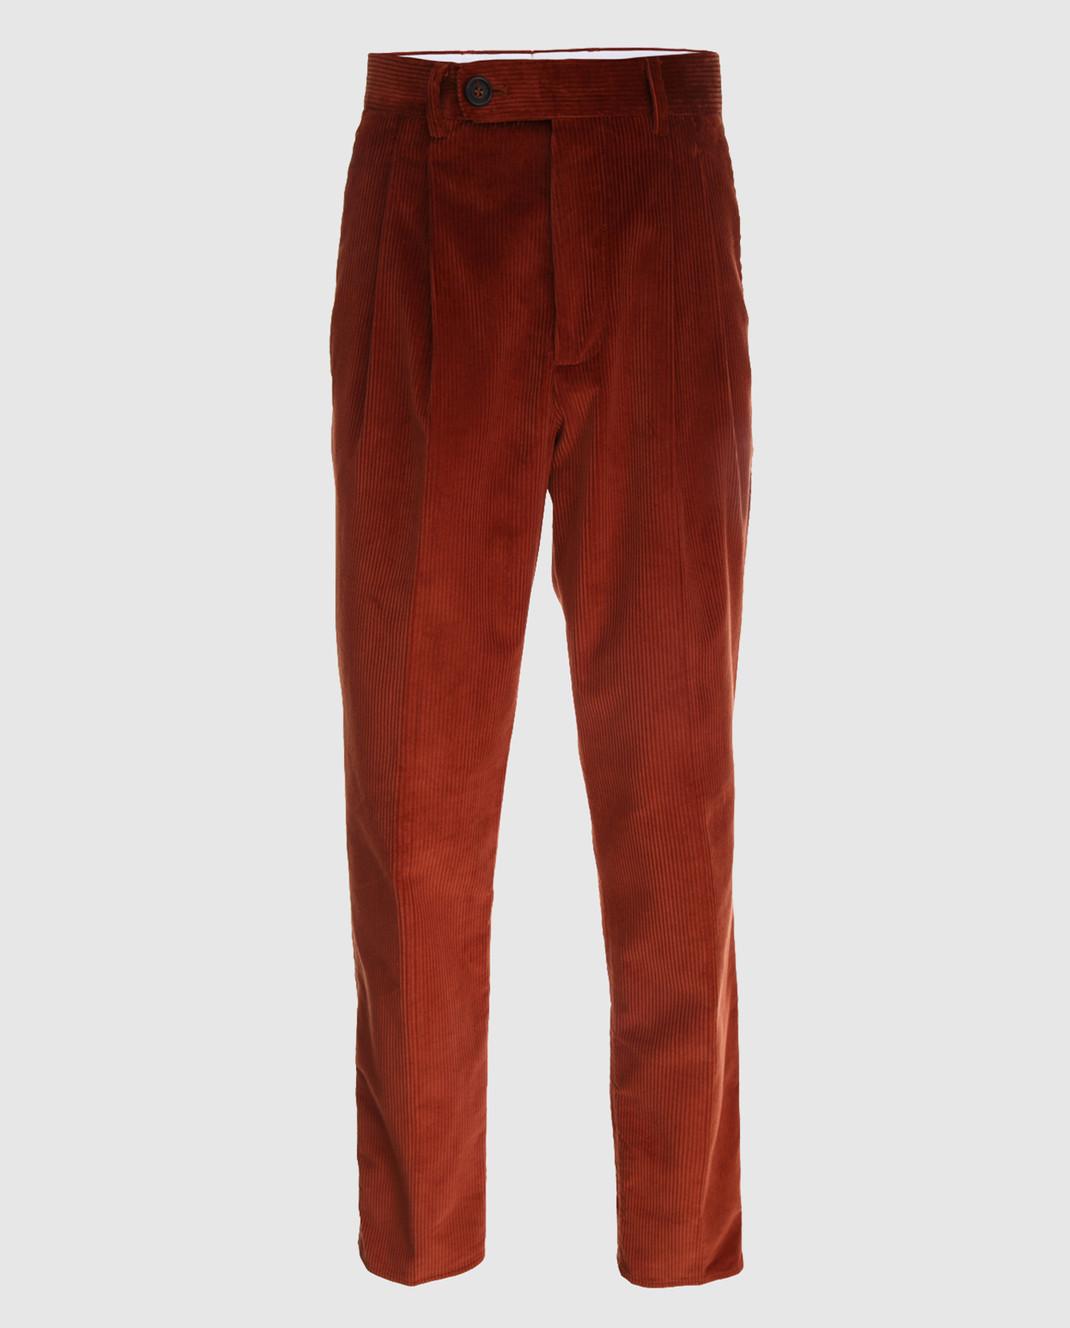 Brunello Cucinelli Терракотовые брюки ME233S2100